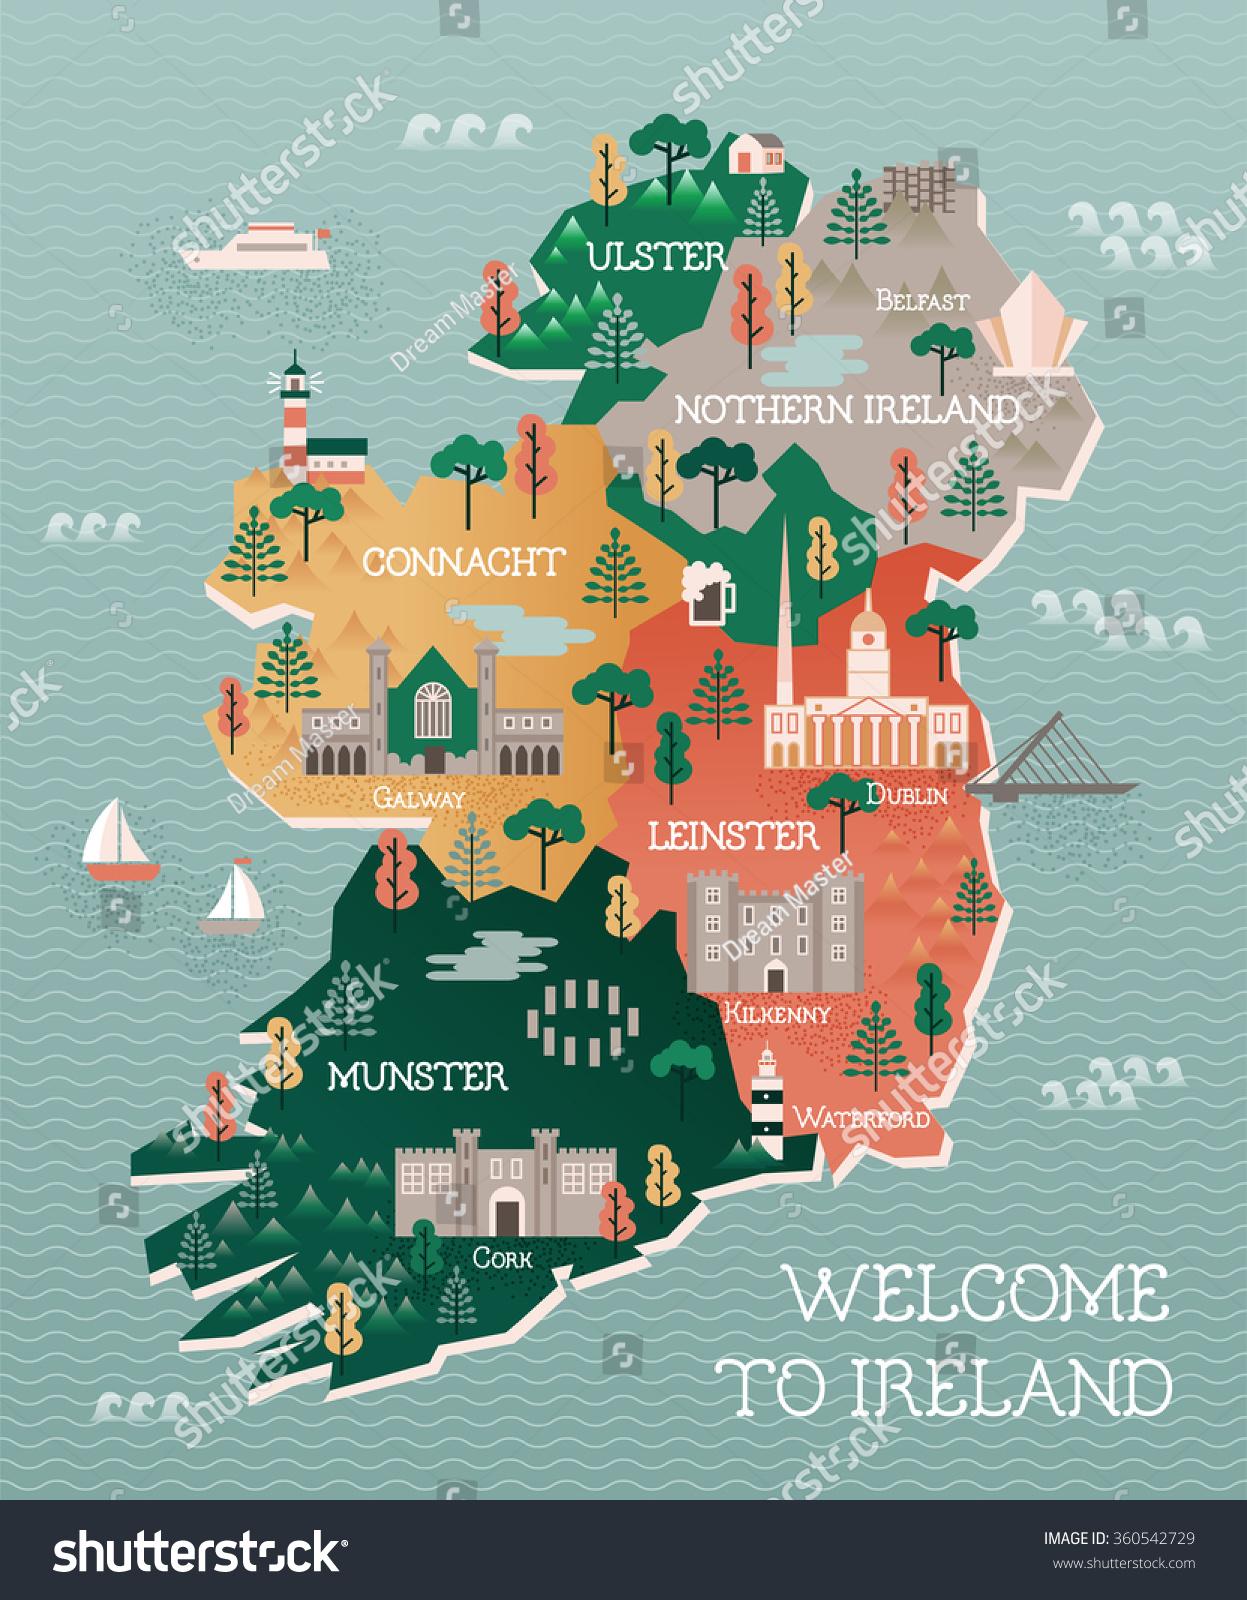 Map Of Ireland Poster.Travel Map Ireland Landmarks Cities Stock Vector Royalty Free